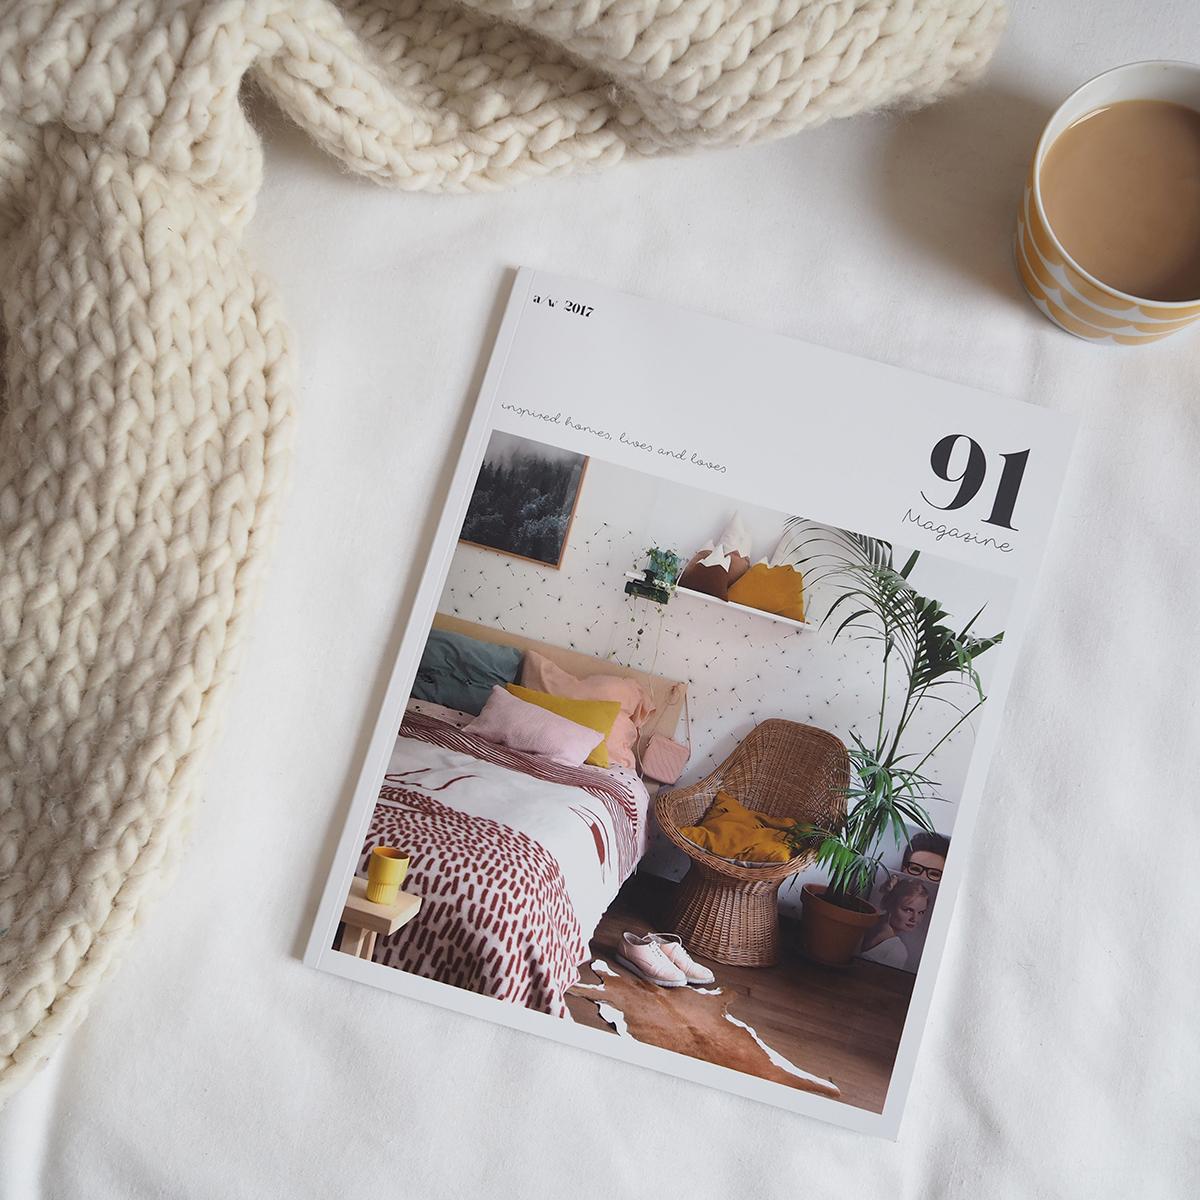 91 Magazine AW17 issue